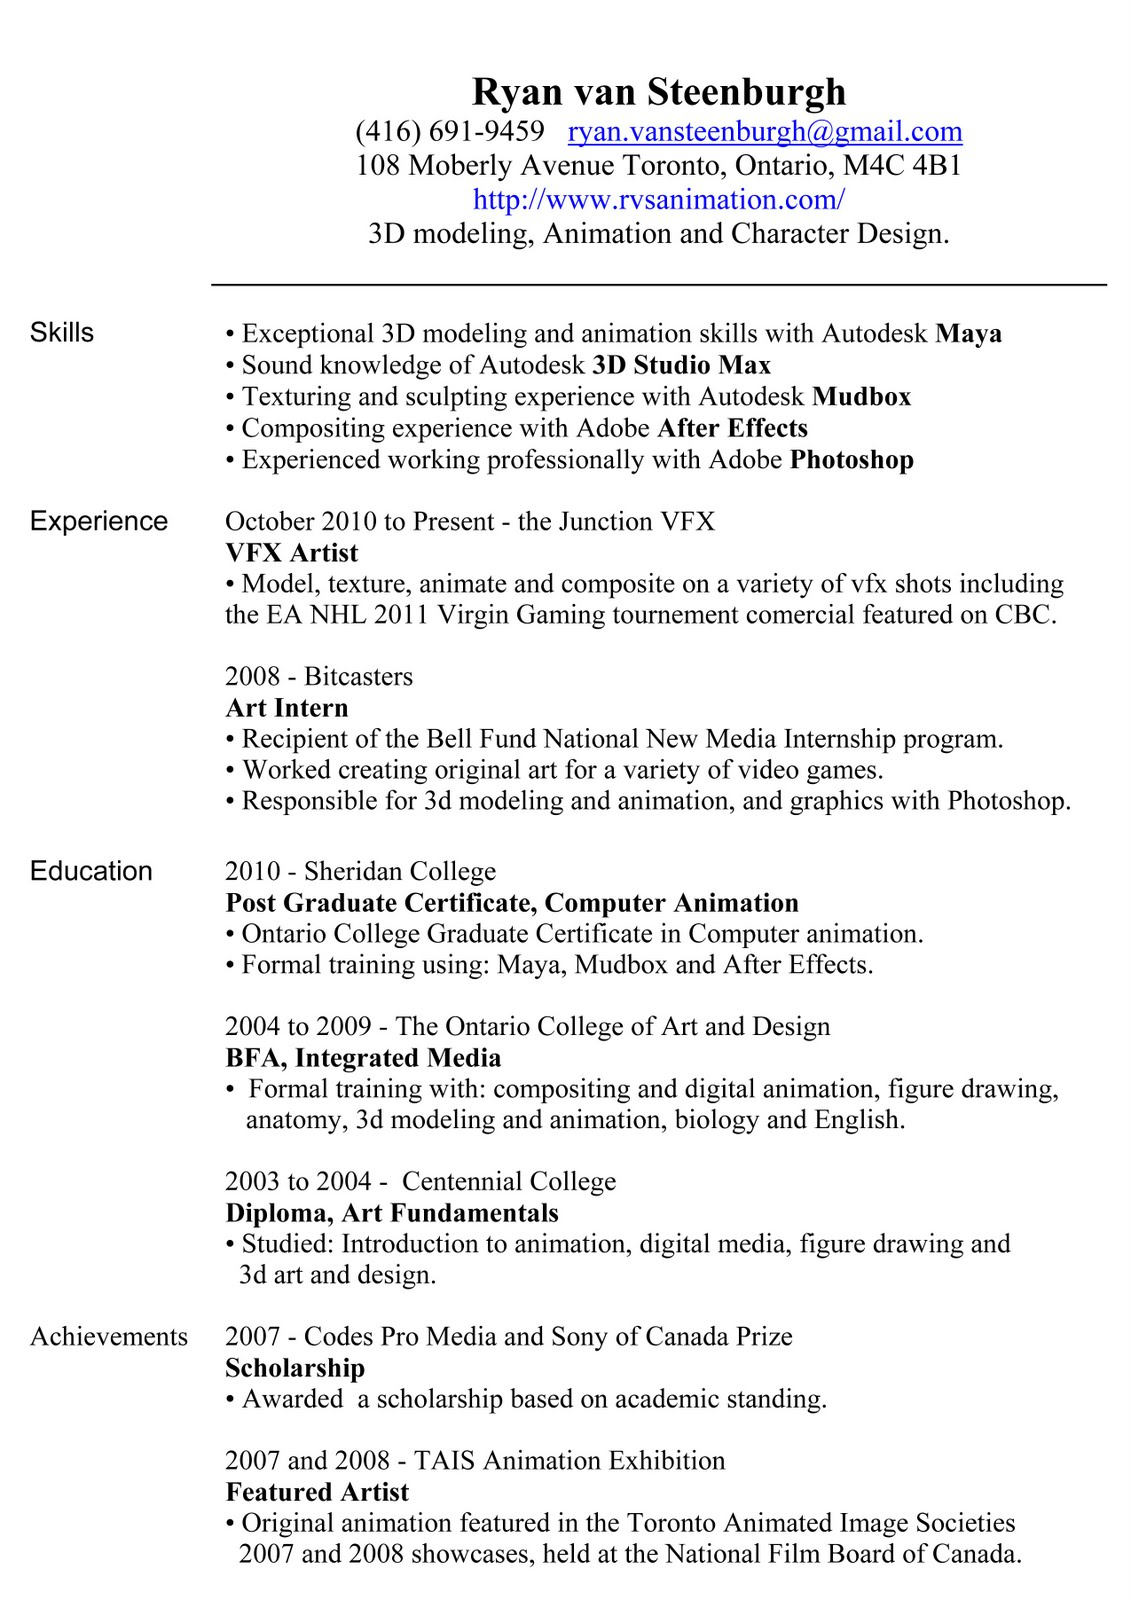 Resume spotty work history